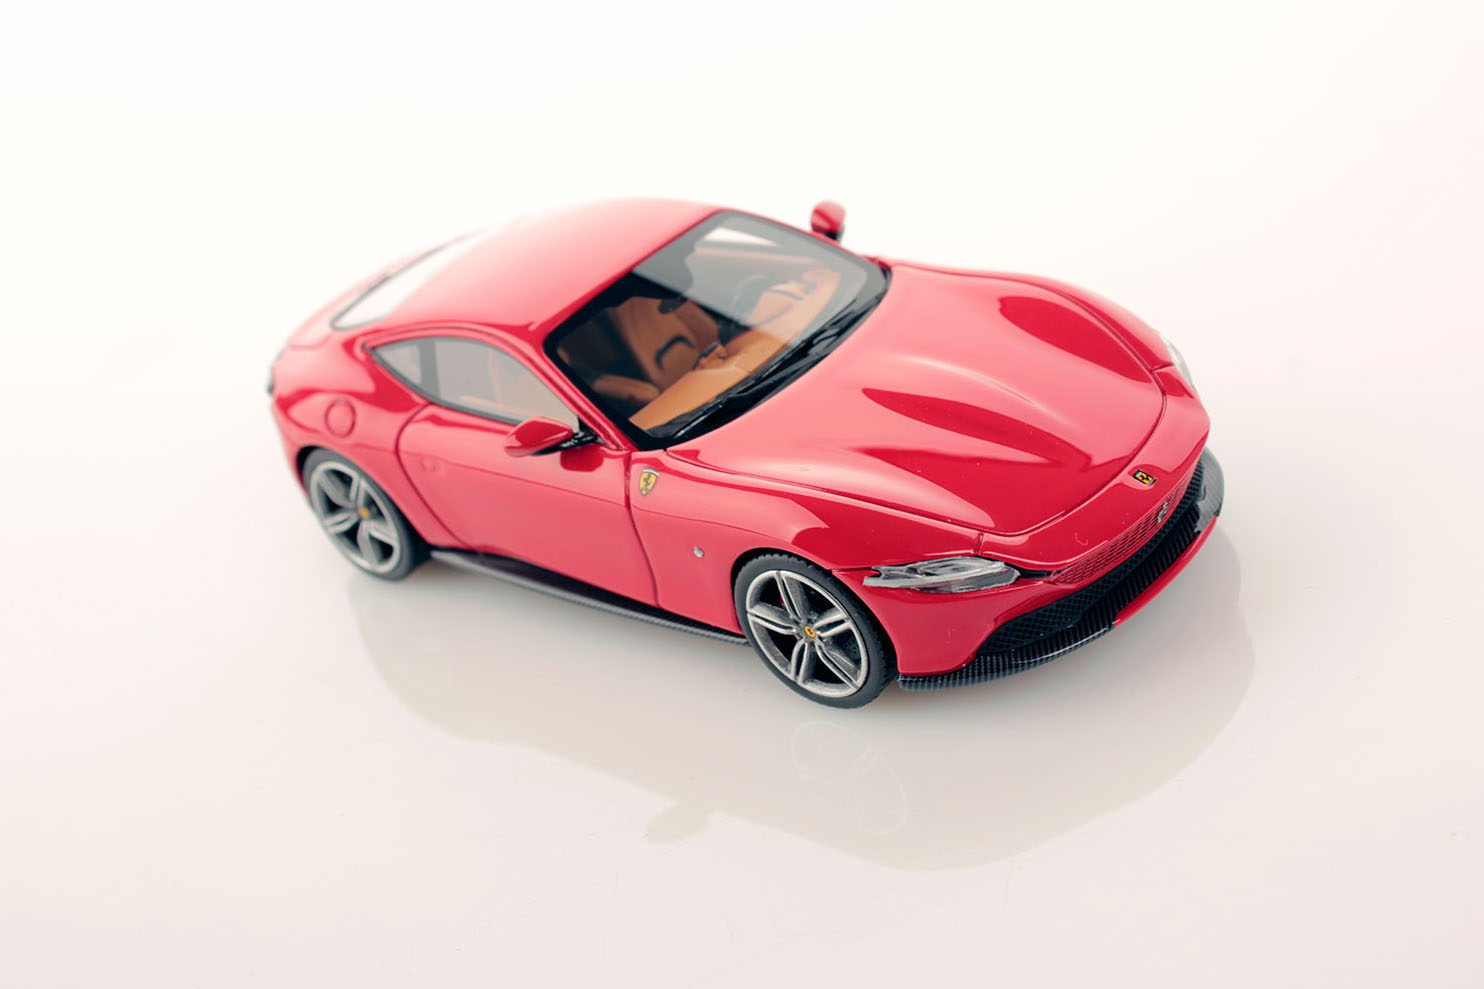 Ferrari Roma 2020 Rosso Corsa Red Looksmart 1 43 Ls508e Coches Camiones Y Furgonetas Automodelismo Y Aeromodelismo